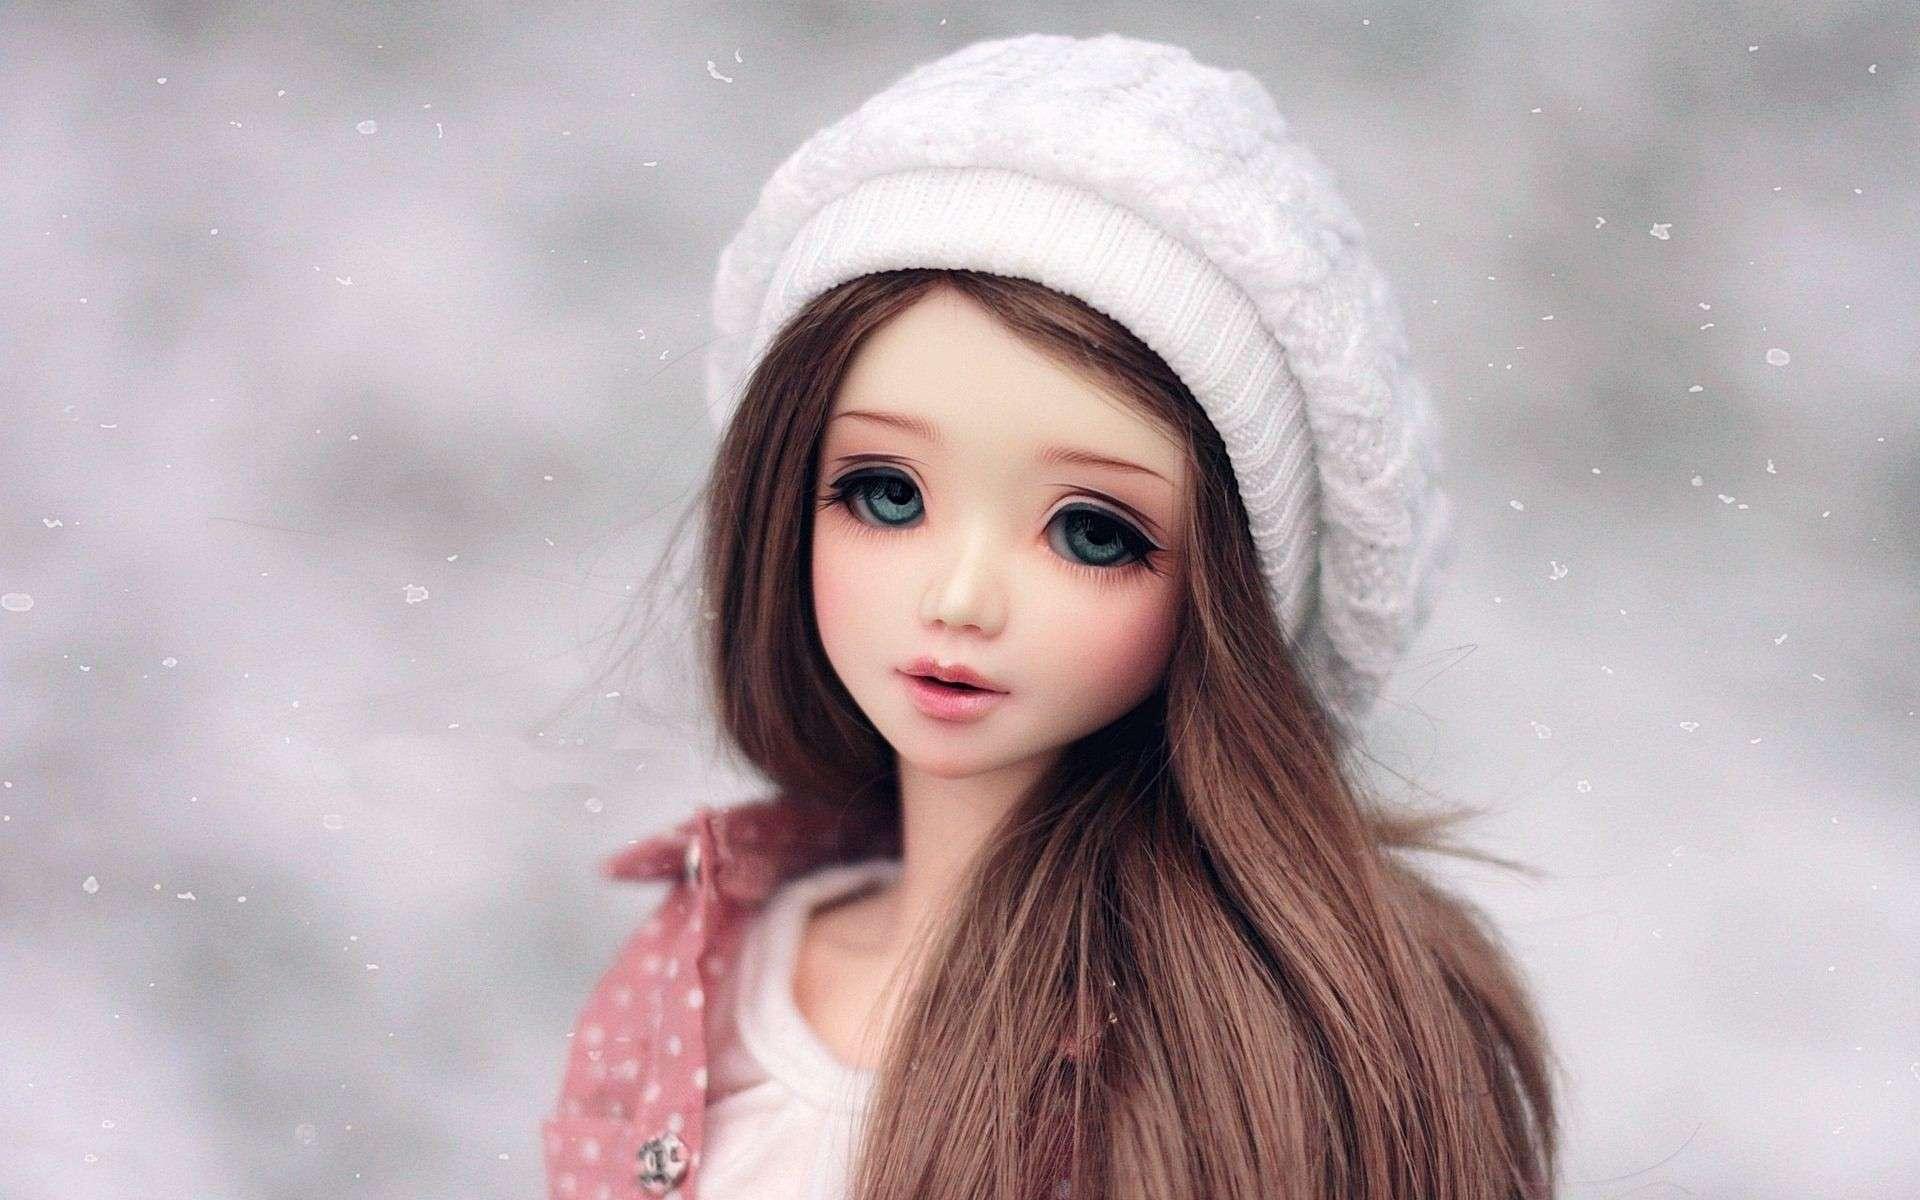 Cool Wallpaper Love Barbie - wc1709820  2018_43727.jpg